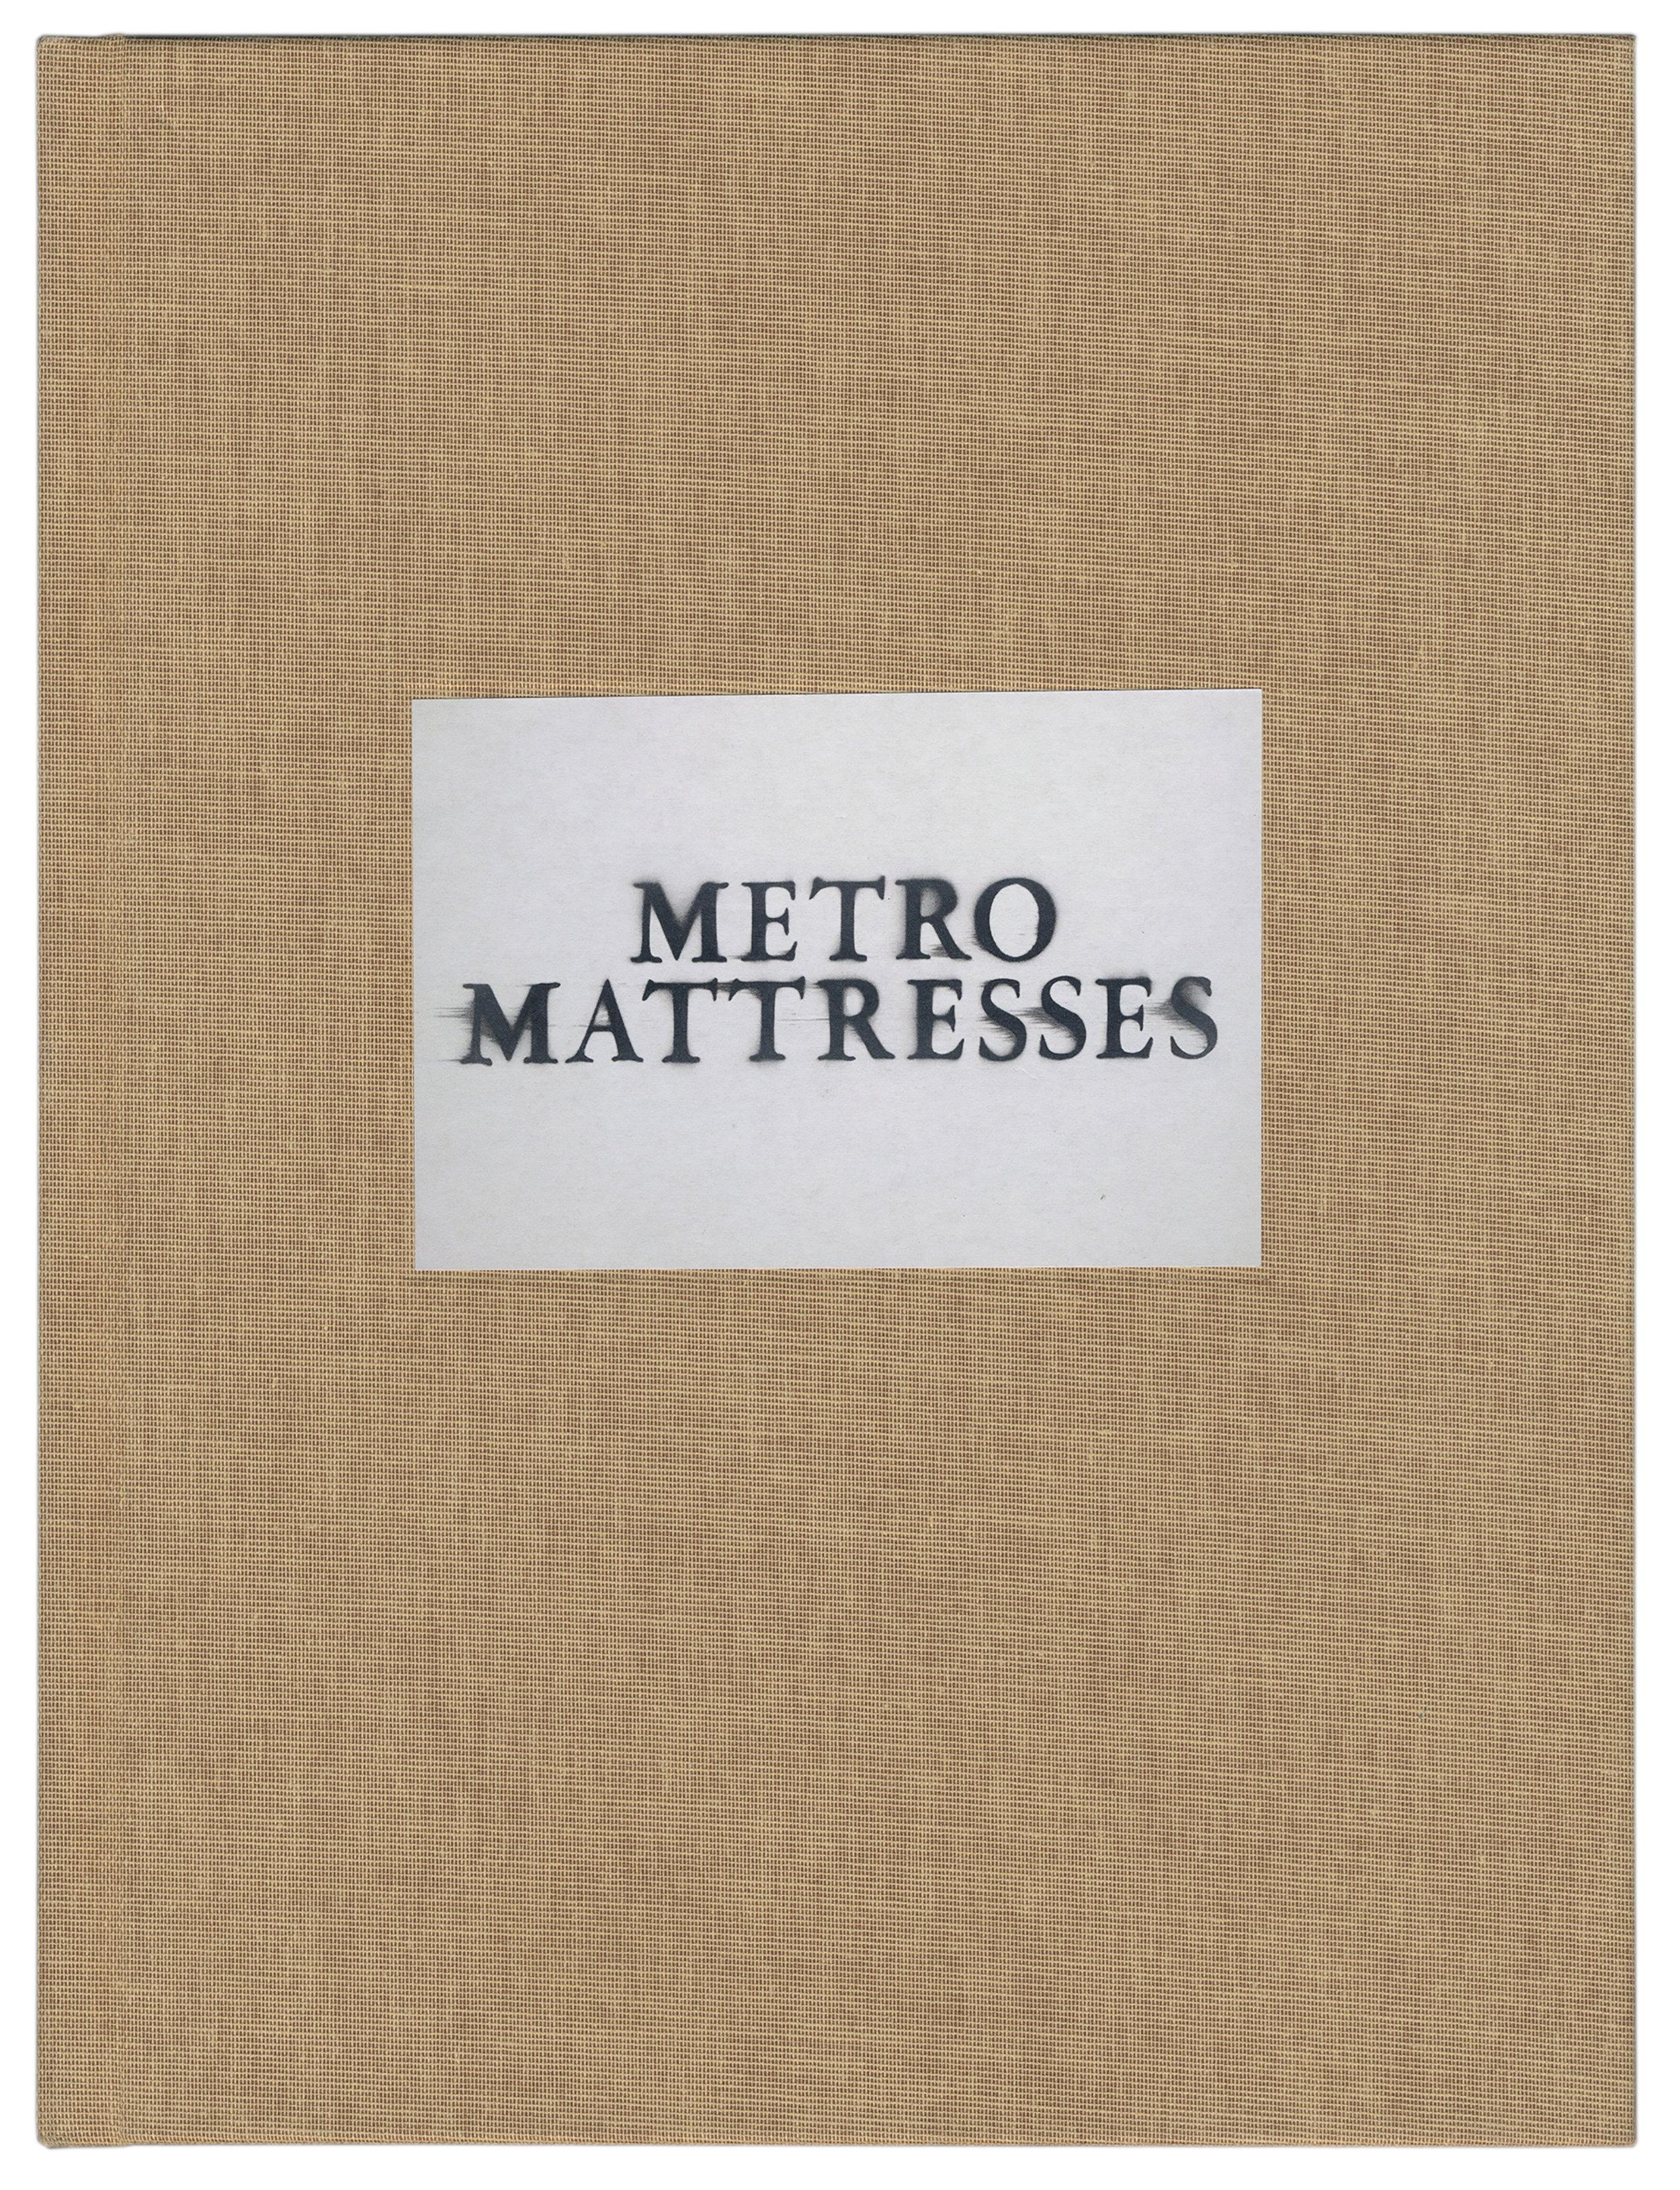 Ed_Ruscha_Metro_Mattresses_Artist_book_01.jpg